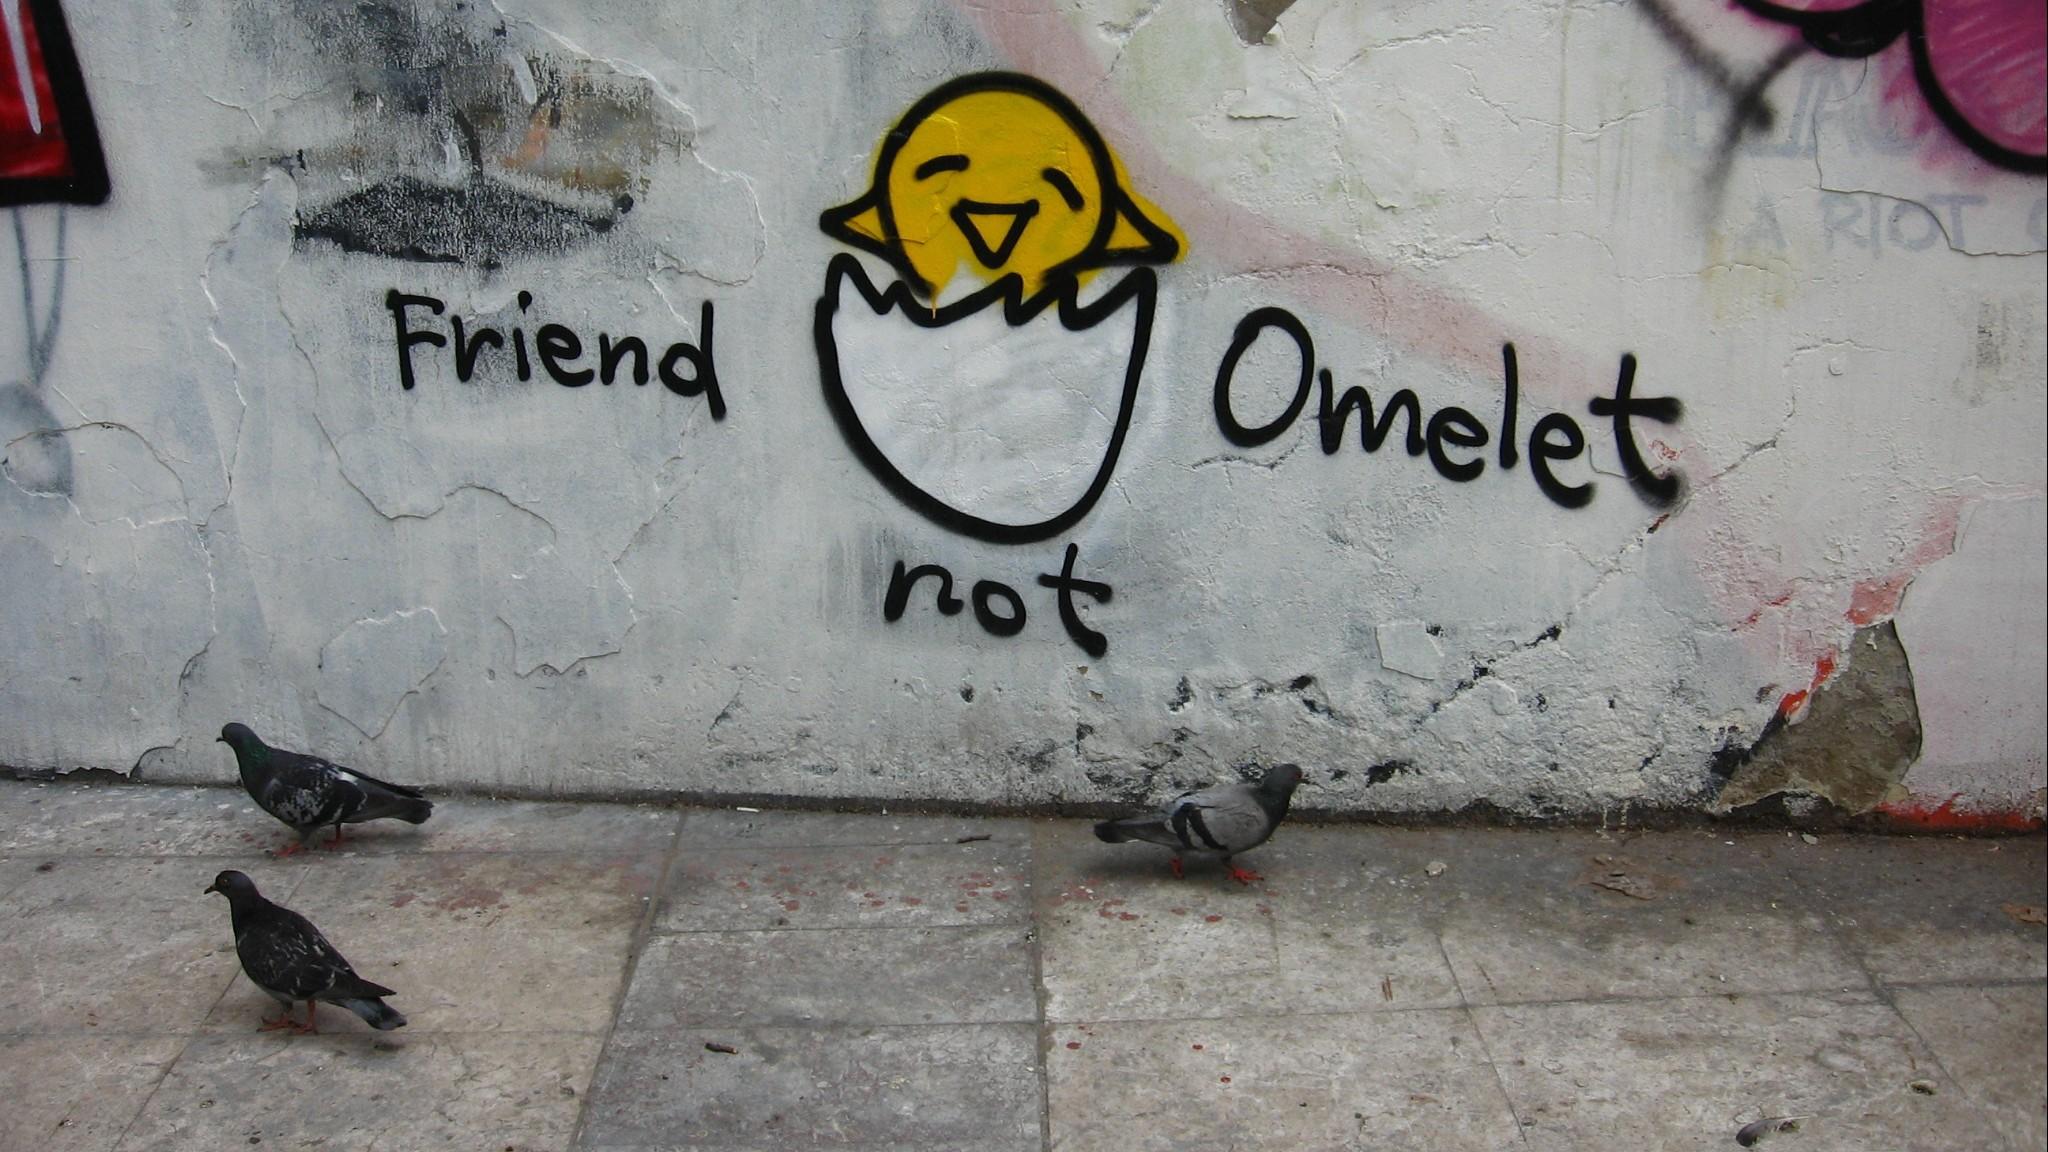 Graffiti with pro-vegan message